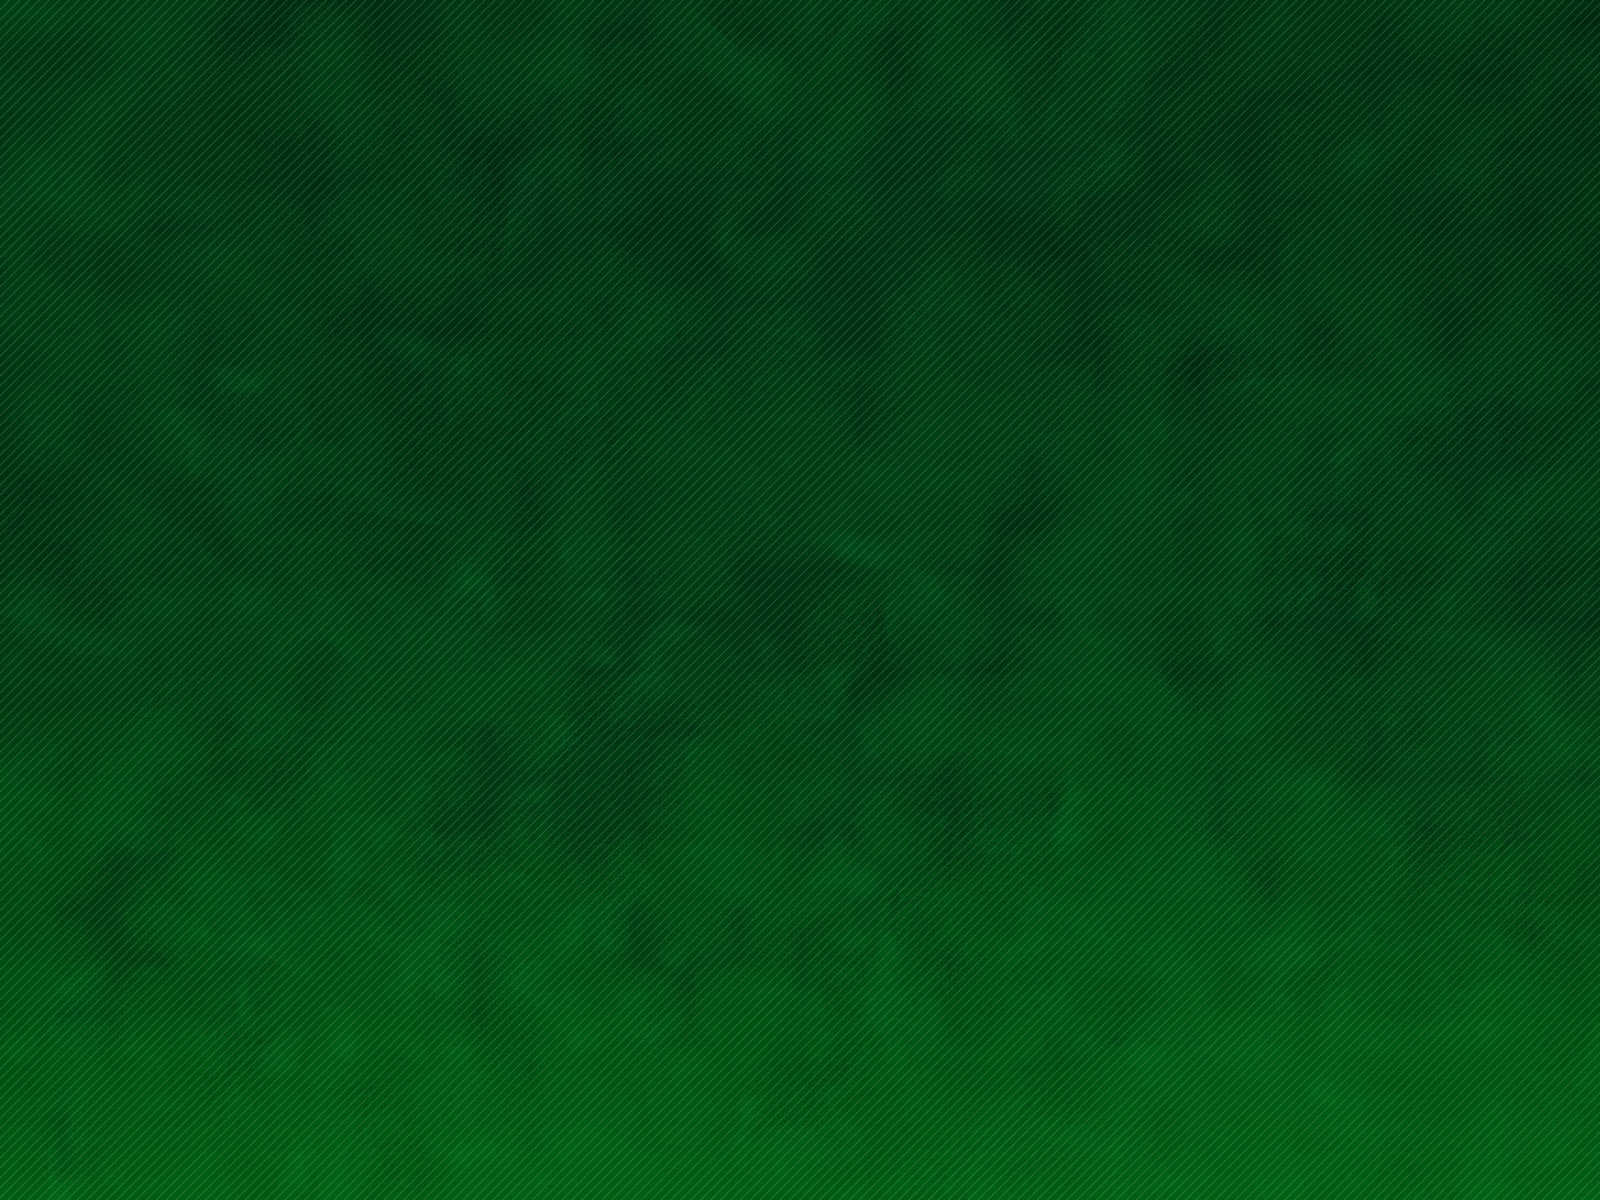 Foton Green wallpapers Foton Green stock photos 1600x1200